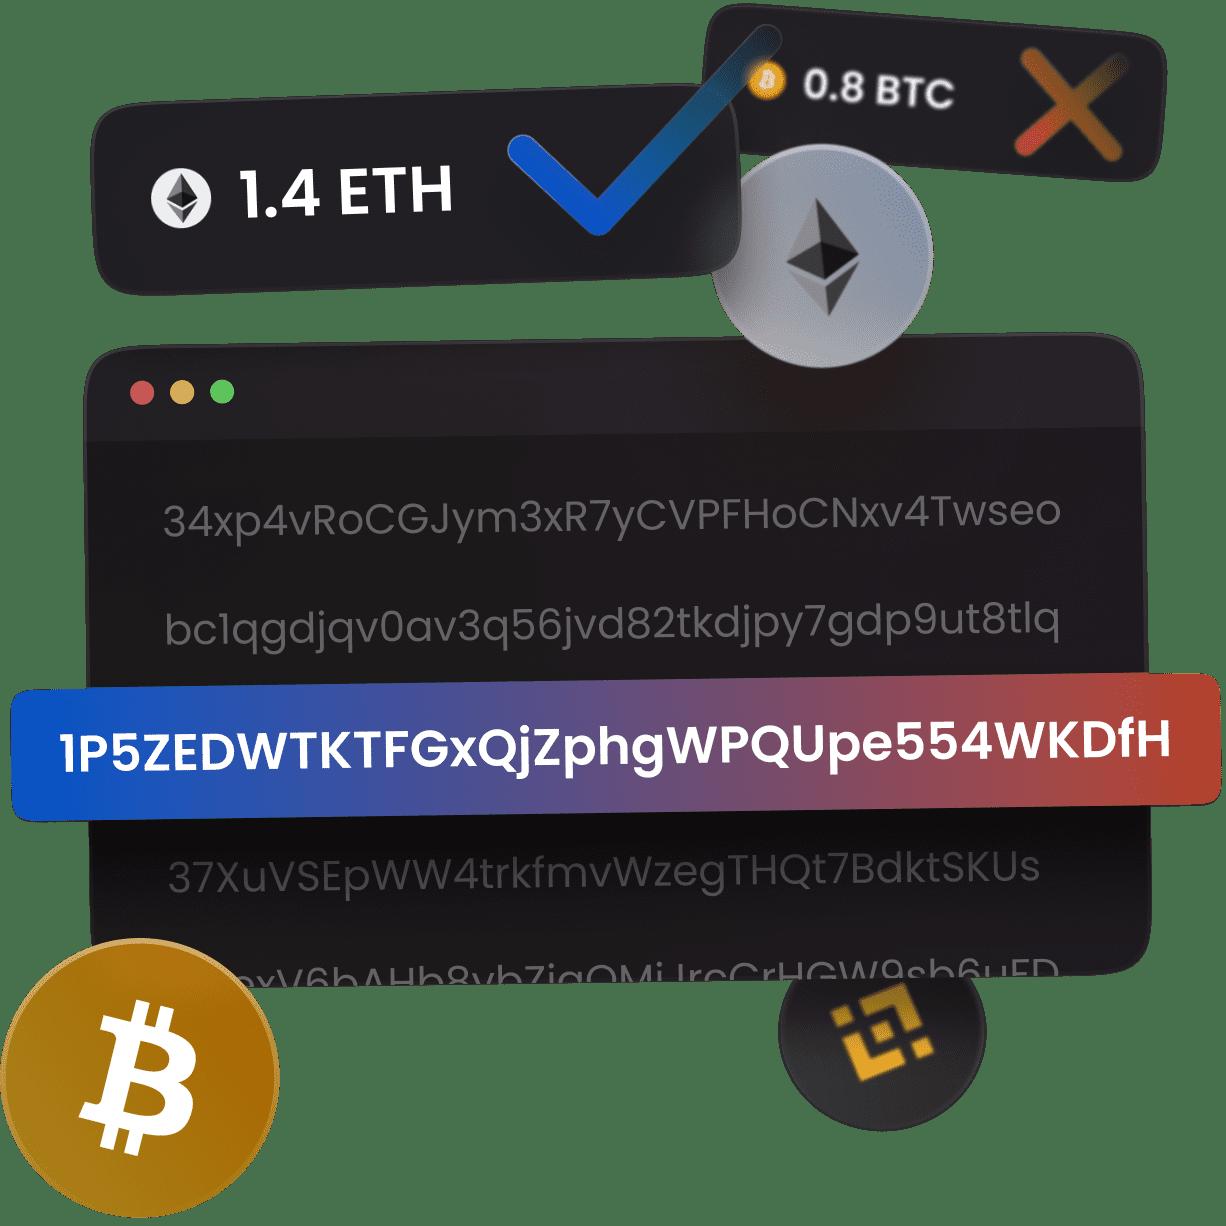 Watchblock account mockup